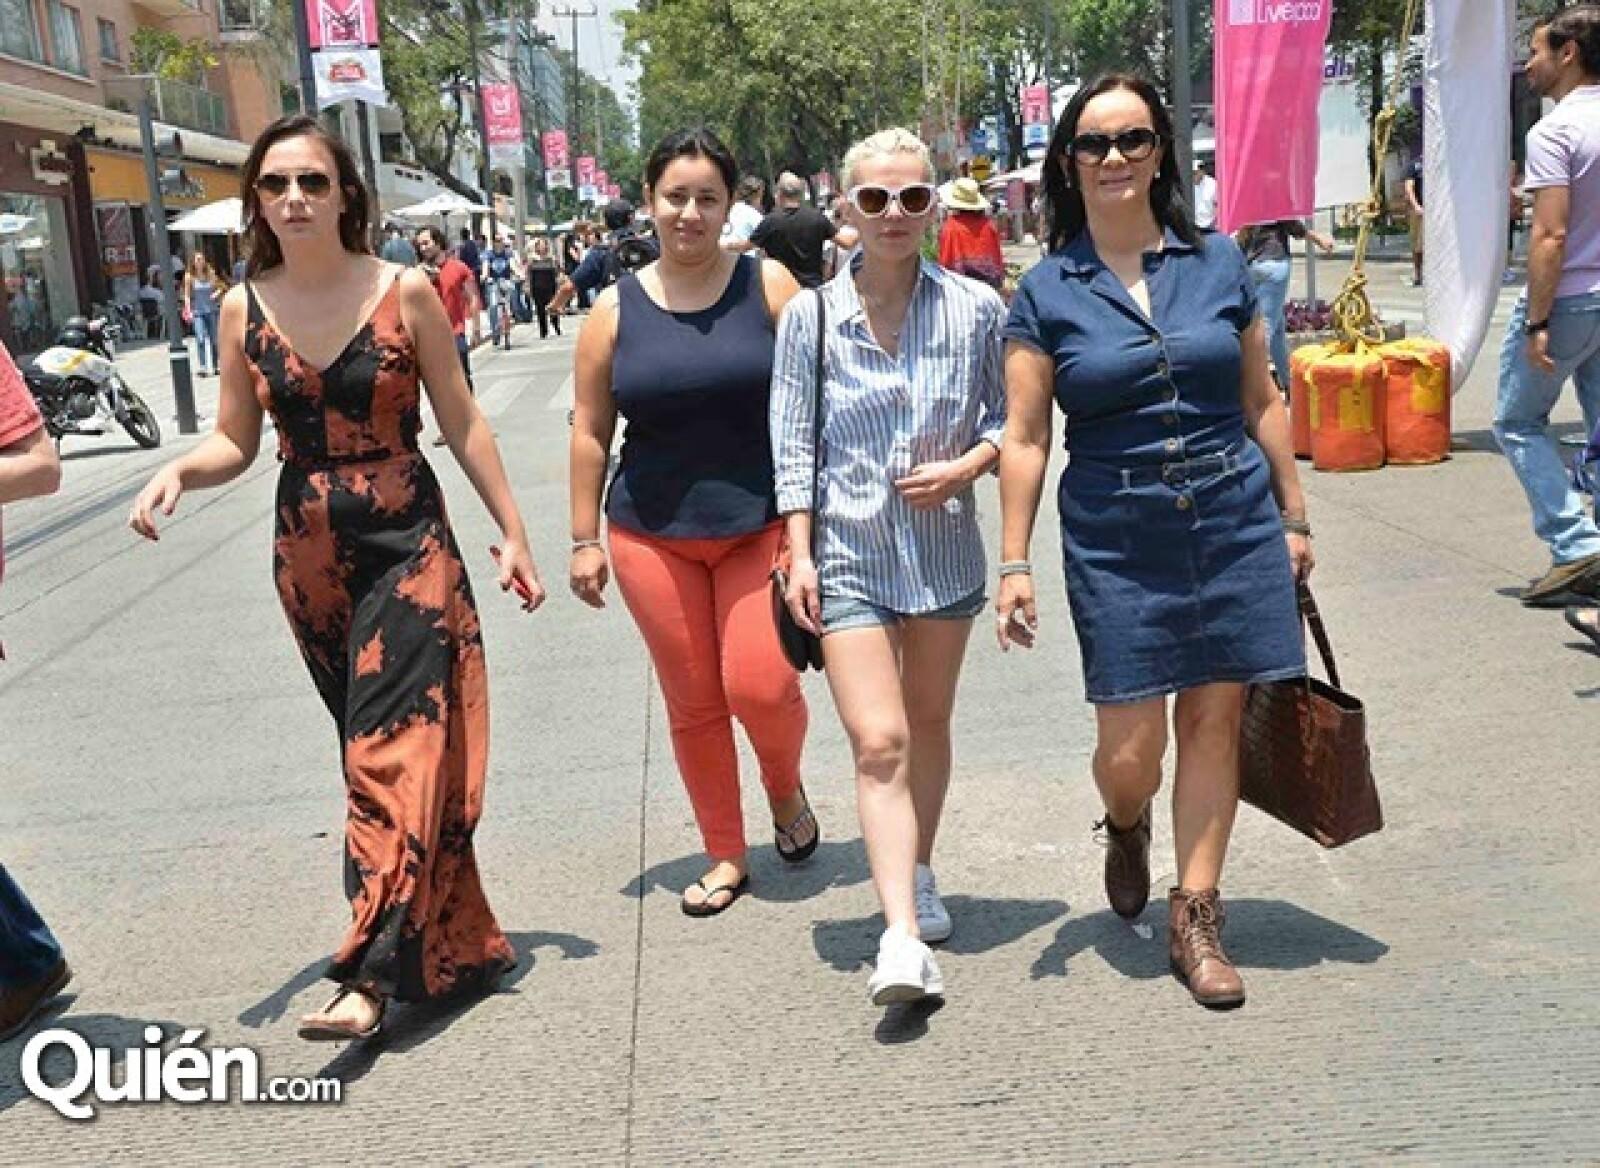 Julie Swanson,Xue Franco,Olenka Piotrawska y Carolina Swanson.